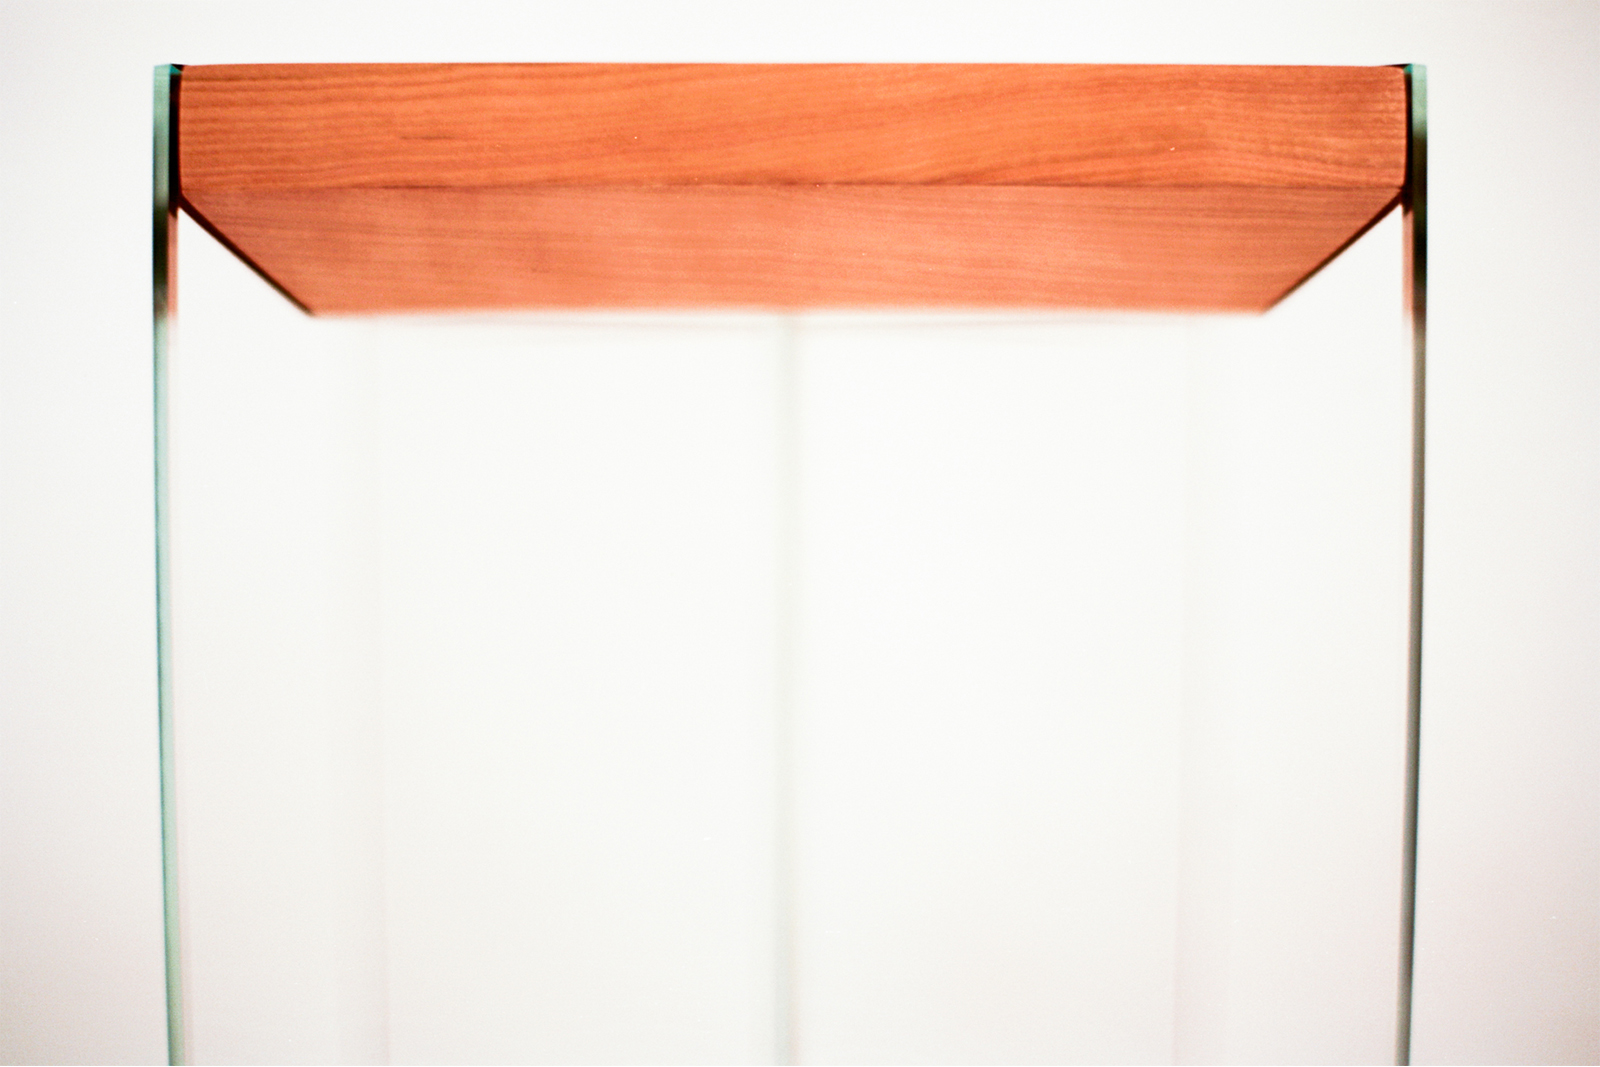 durodeco_Dream Table (1).jpg